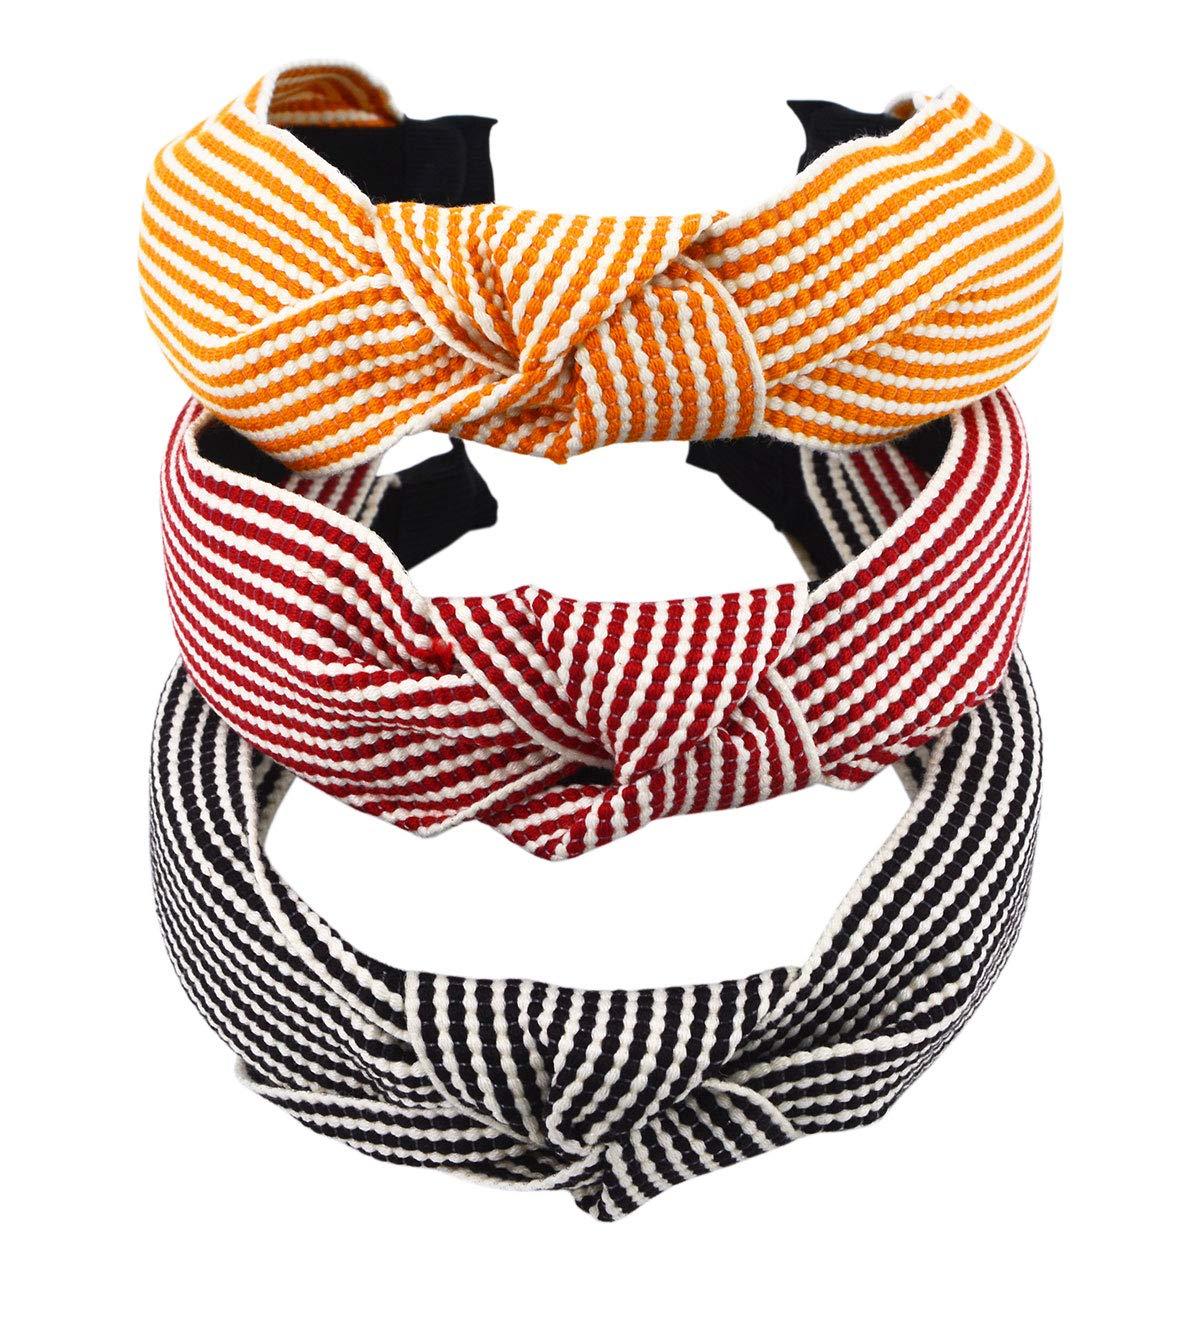 STHUAHE 3 PCS Women Gir Hight Quality Handmade Sweet Style Cloth Cross Knot Hair Hoop Hairband Headband Headwear Hair Accessories by Beauty Hair (3 Color) by STHUAHE